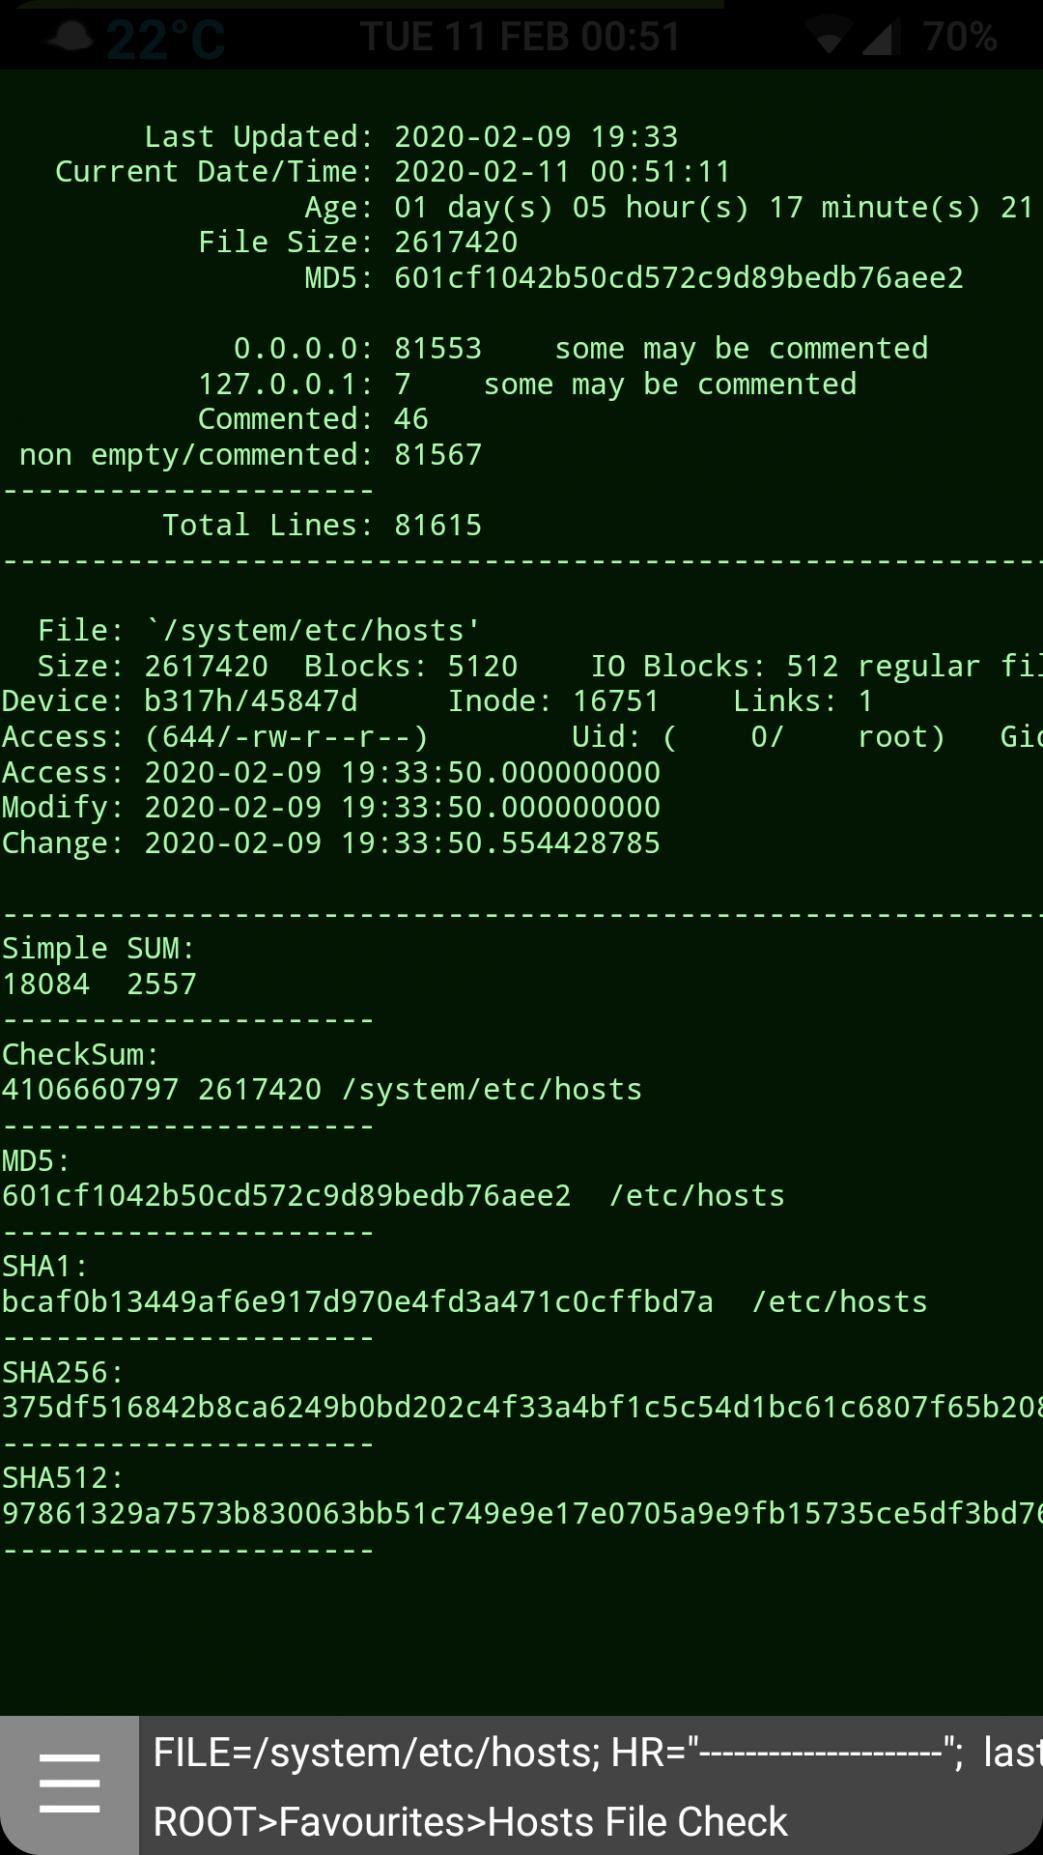 Click image for larger version  Name:Screenshot_TeMeFI_20200211-005146.jpg Views:68 Size:197.5 KB ID:4947839